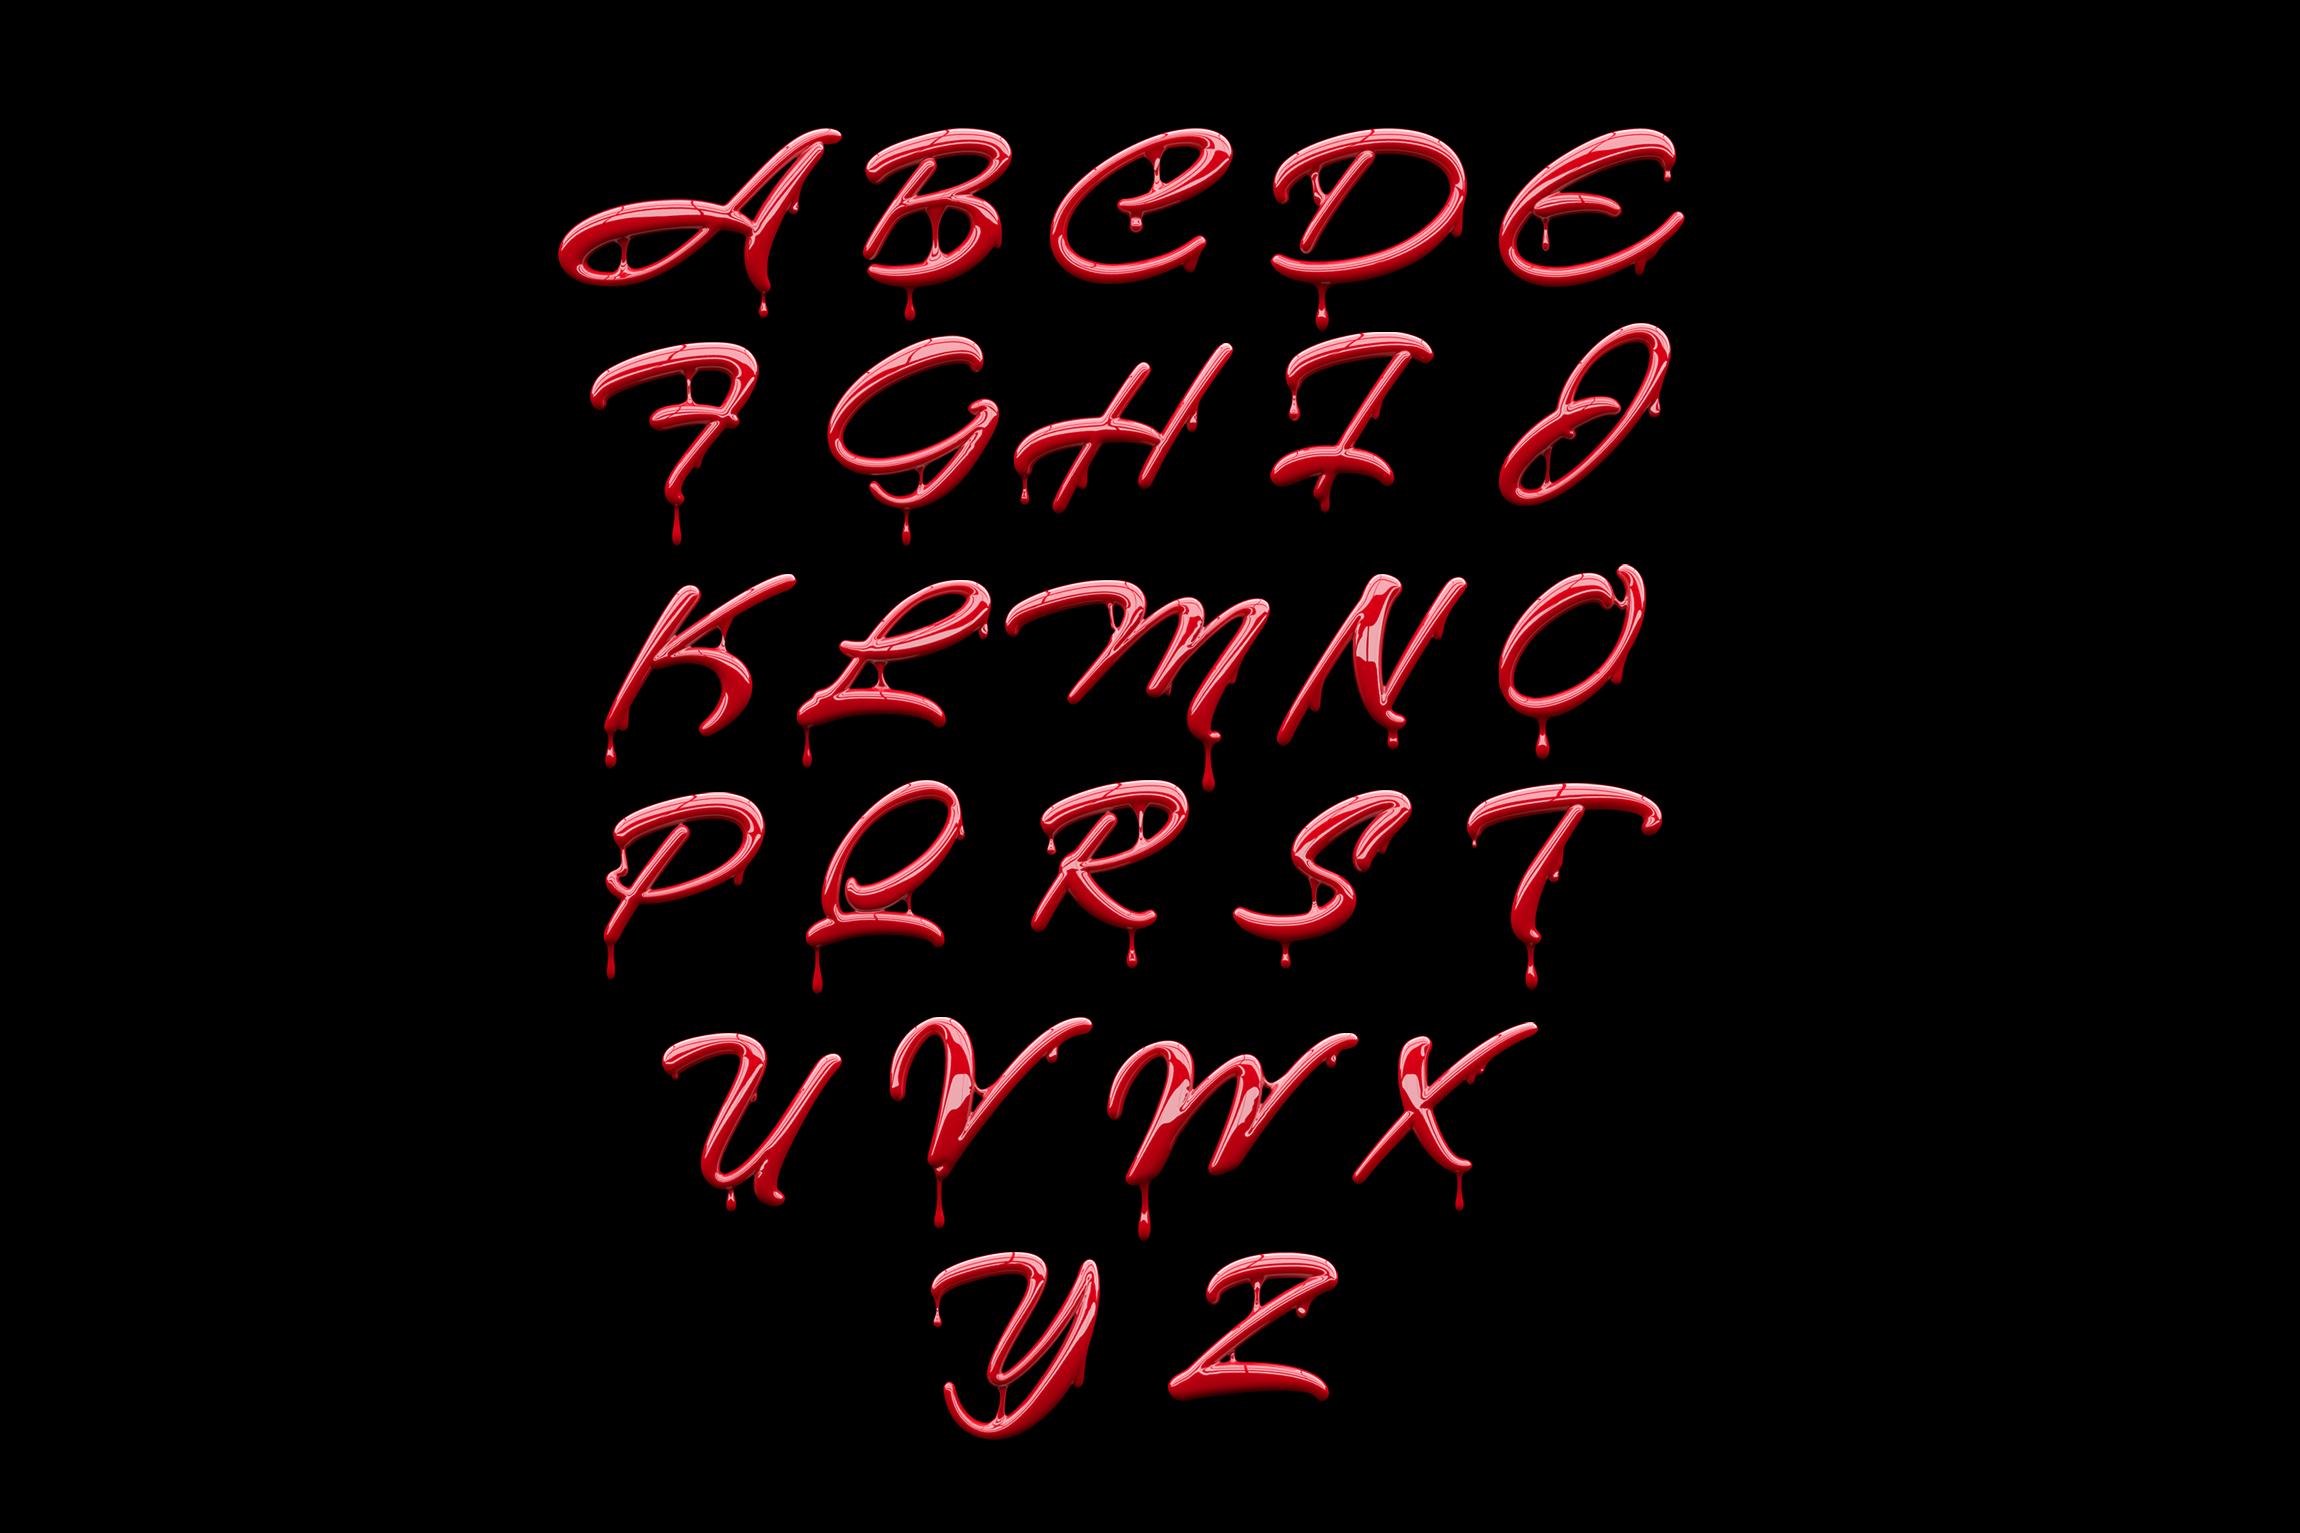 3D Paint Psd Font for Photoshop - GK Mockups Store